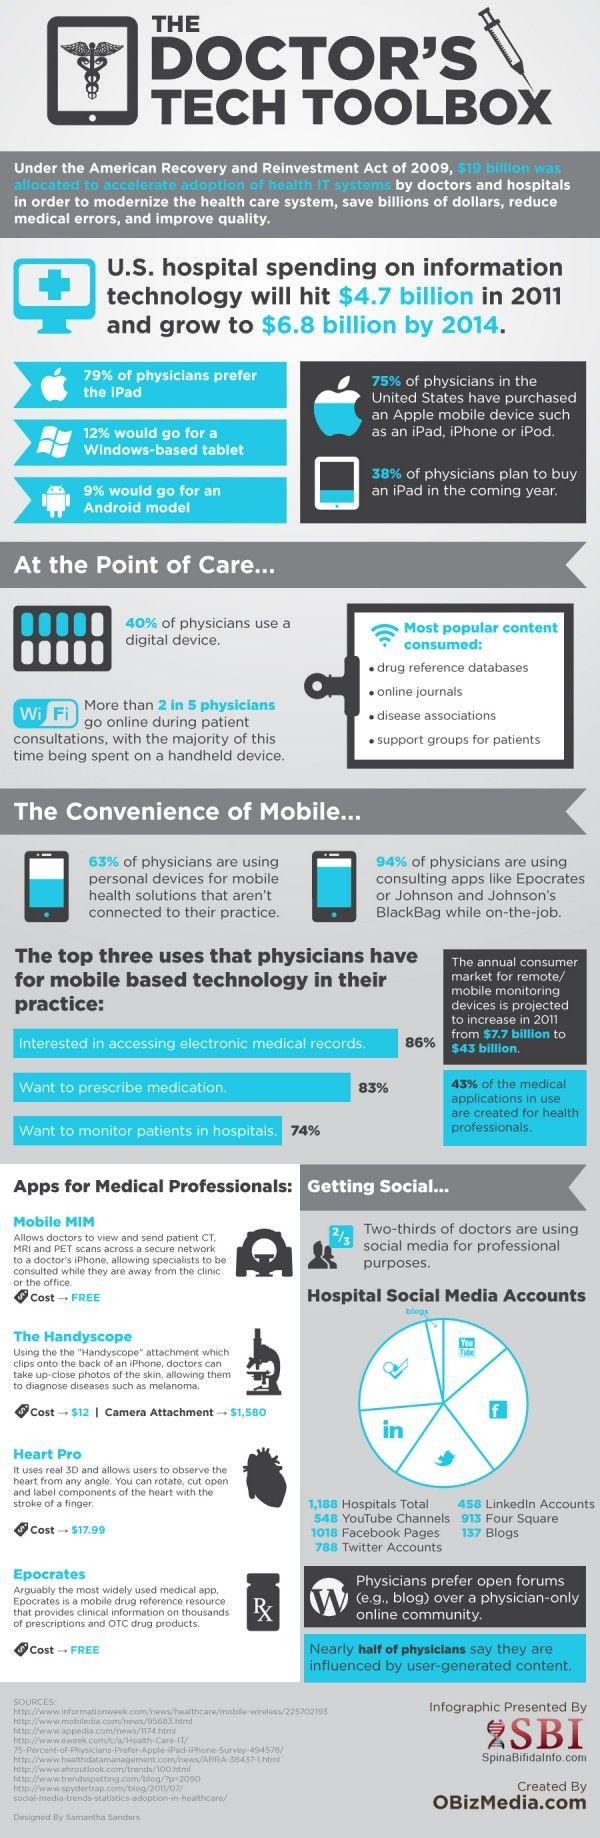 #Doctor's Tech Toolbox. #healthtech #mhealth #telehealth #digitalhealth #healthit